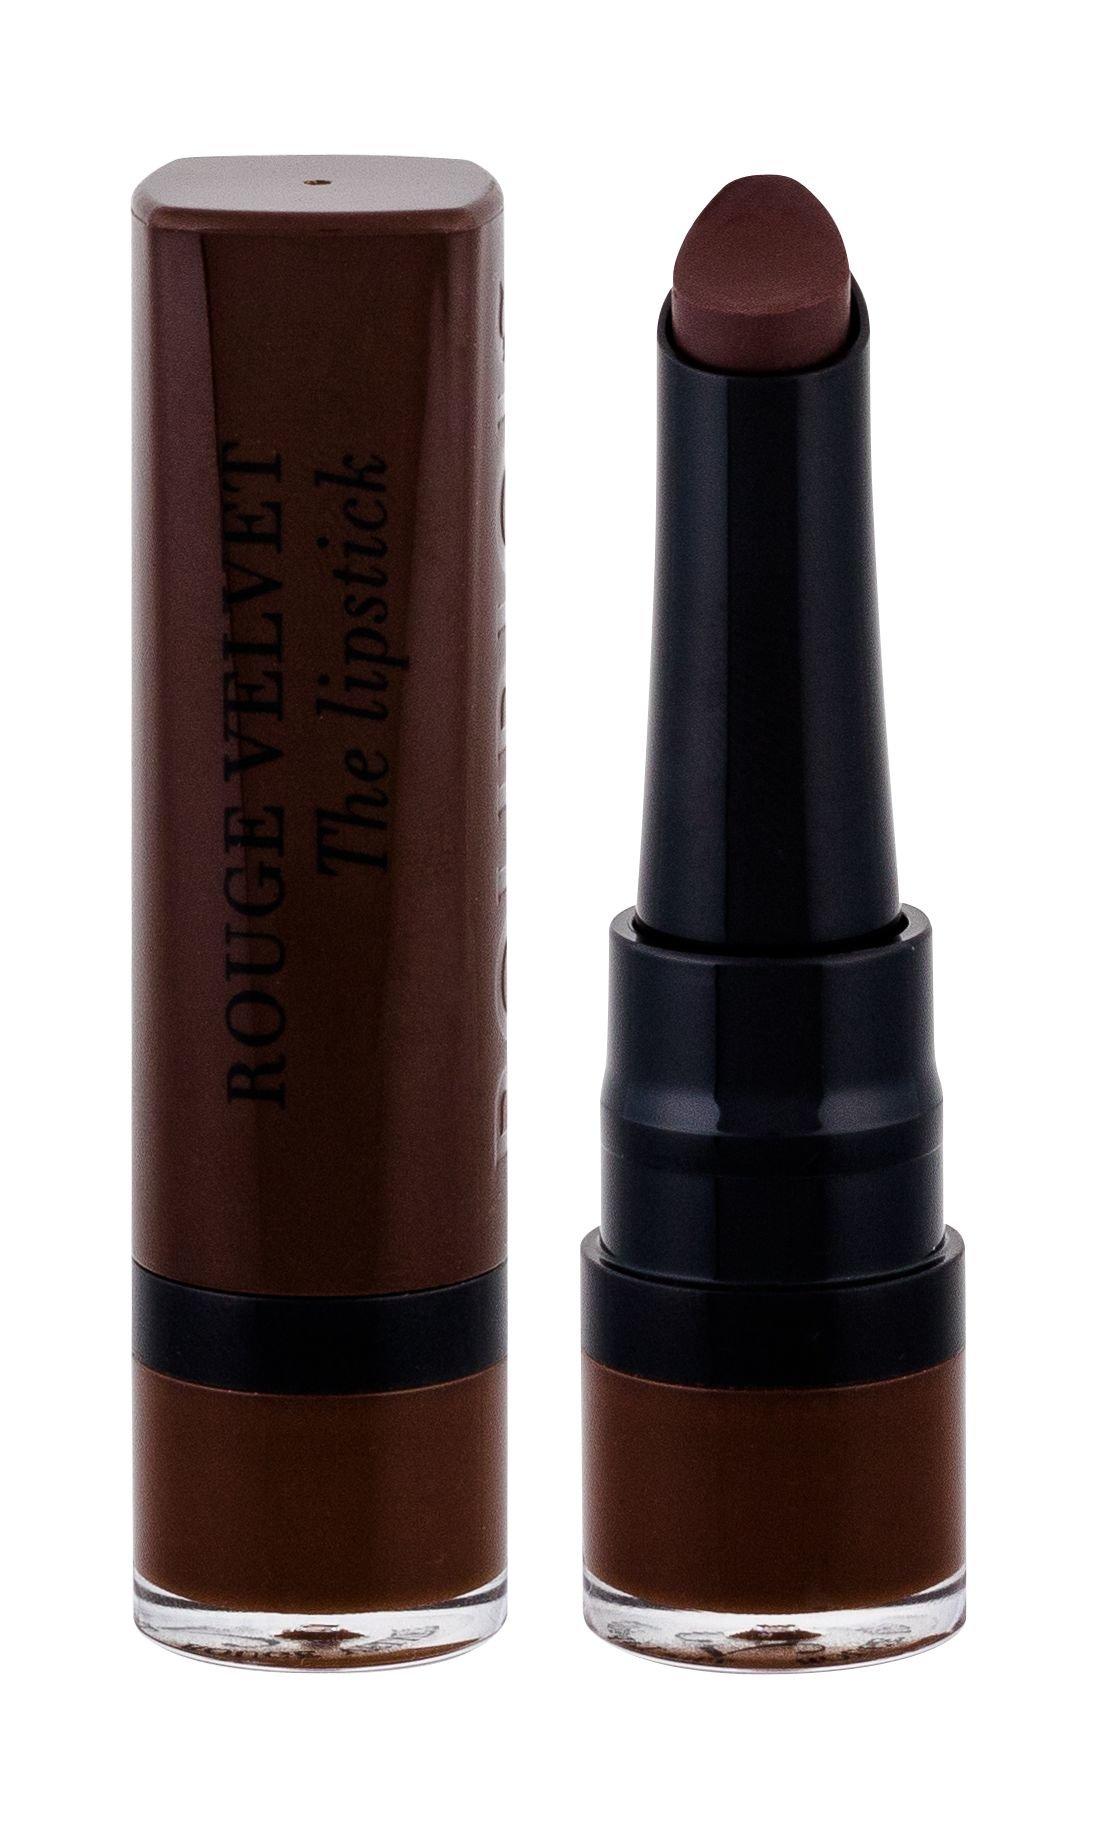 BOURJOIS Paris Rouge Velvet Lipstick 2,4ml 25 Maca´brown